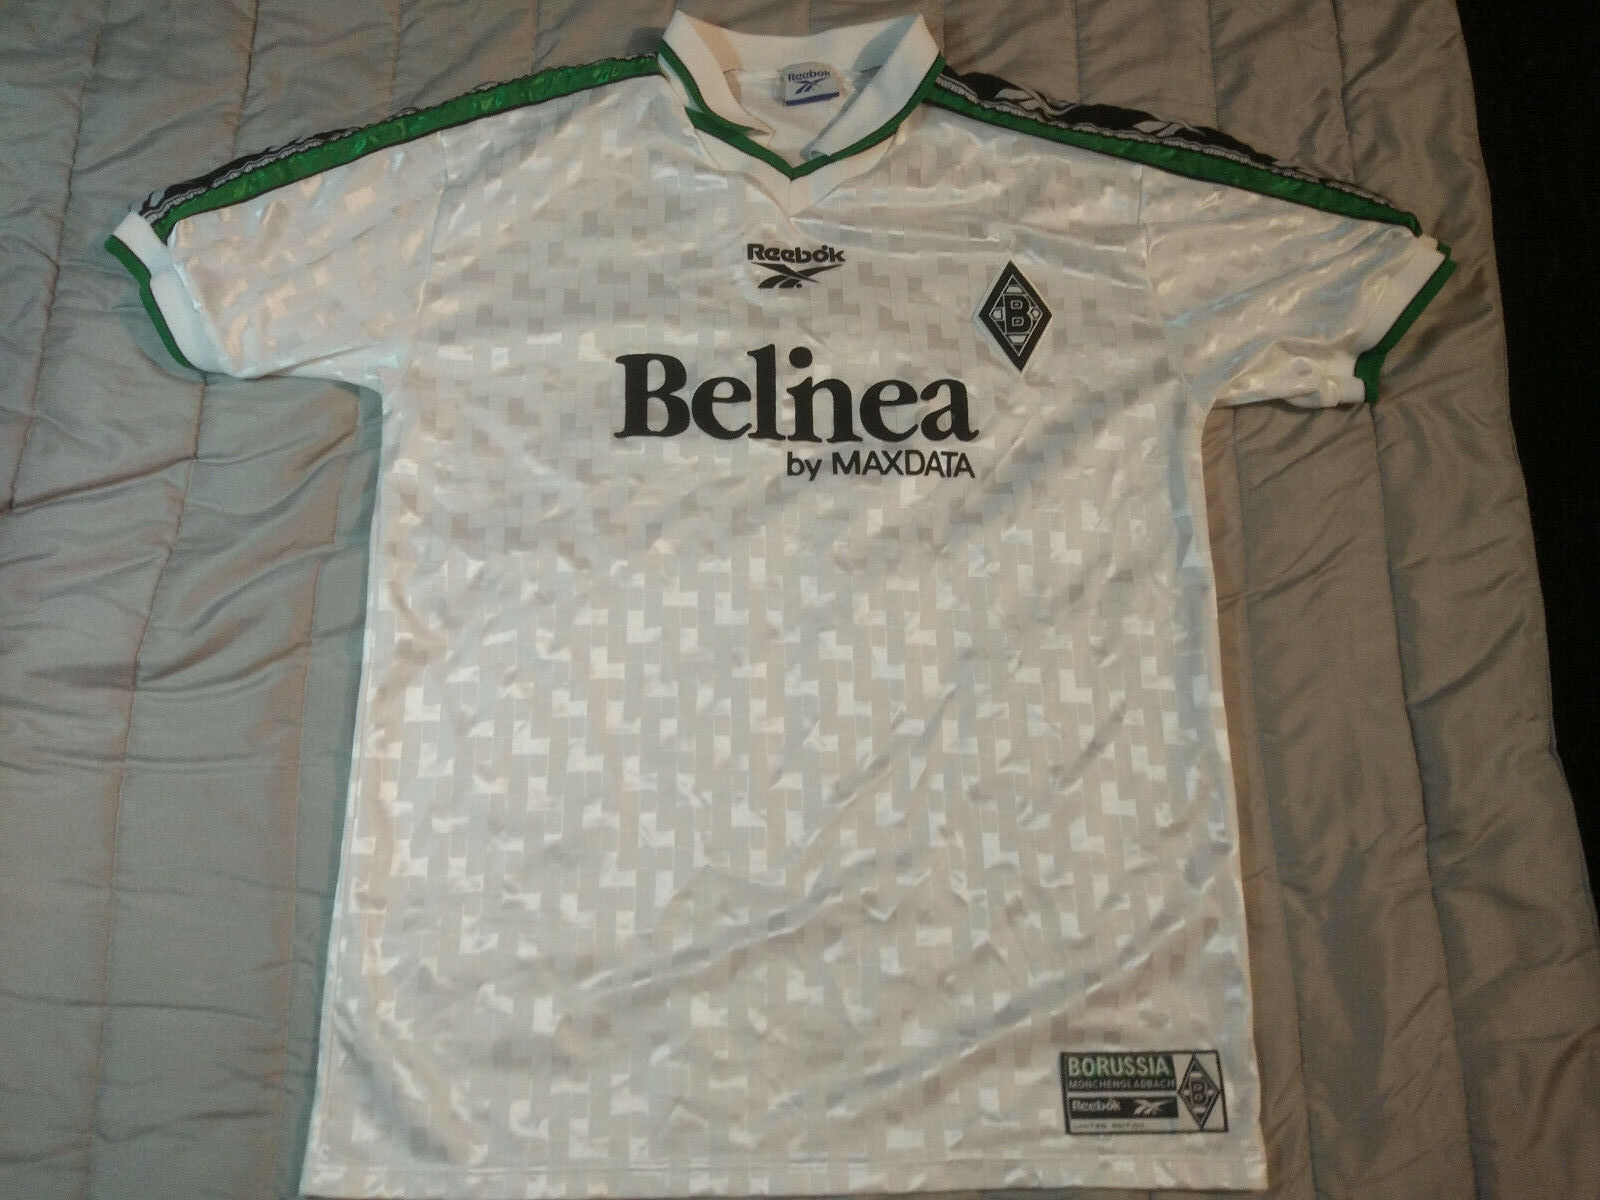 Borussia Monchengladbach L 1998  Reebok Trikot Shirt Jersey Germany Bundesliga